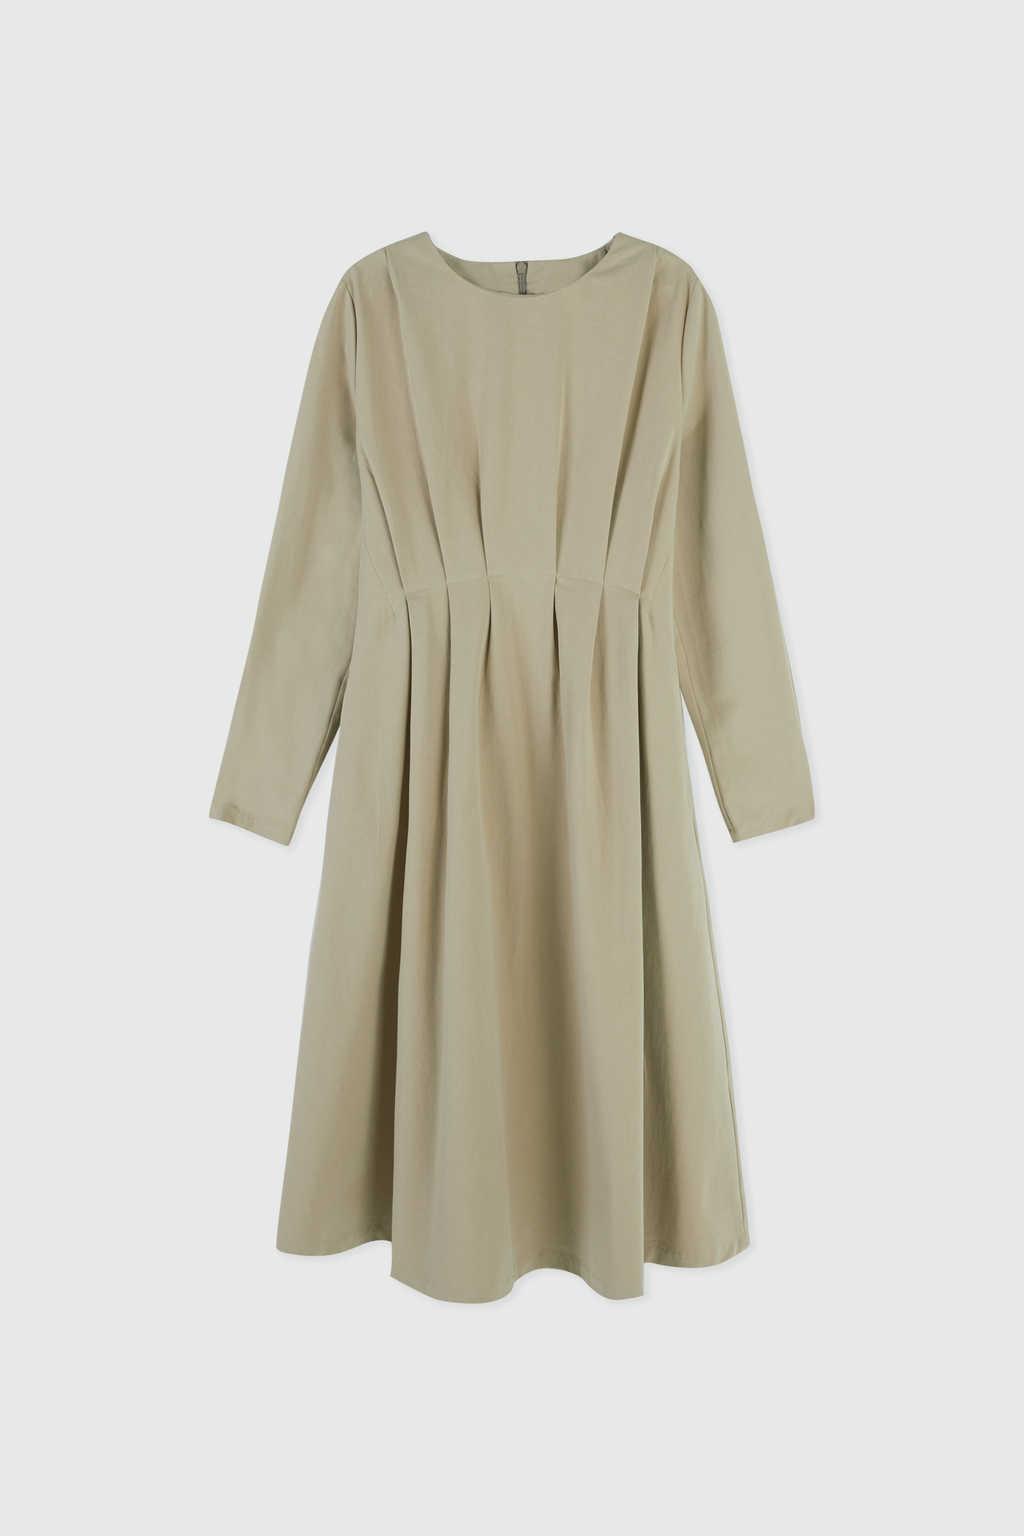 Dress 3081 Khaki 4